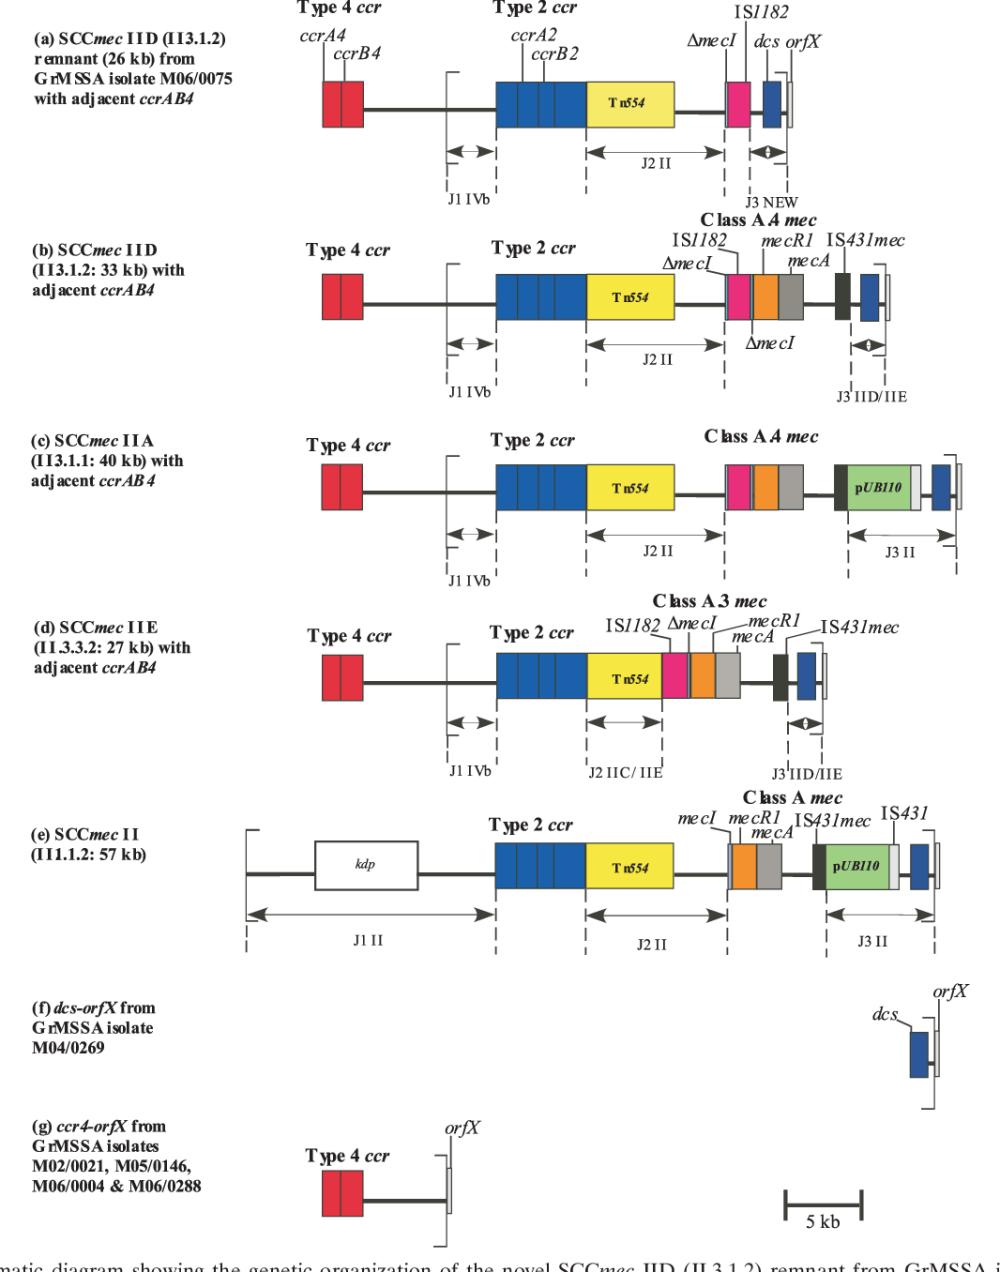 medium resolution of schematic diagram showing the genetic organization of the novel sccmec iid